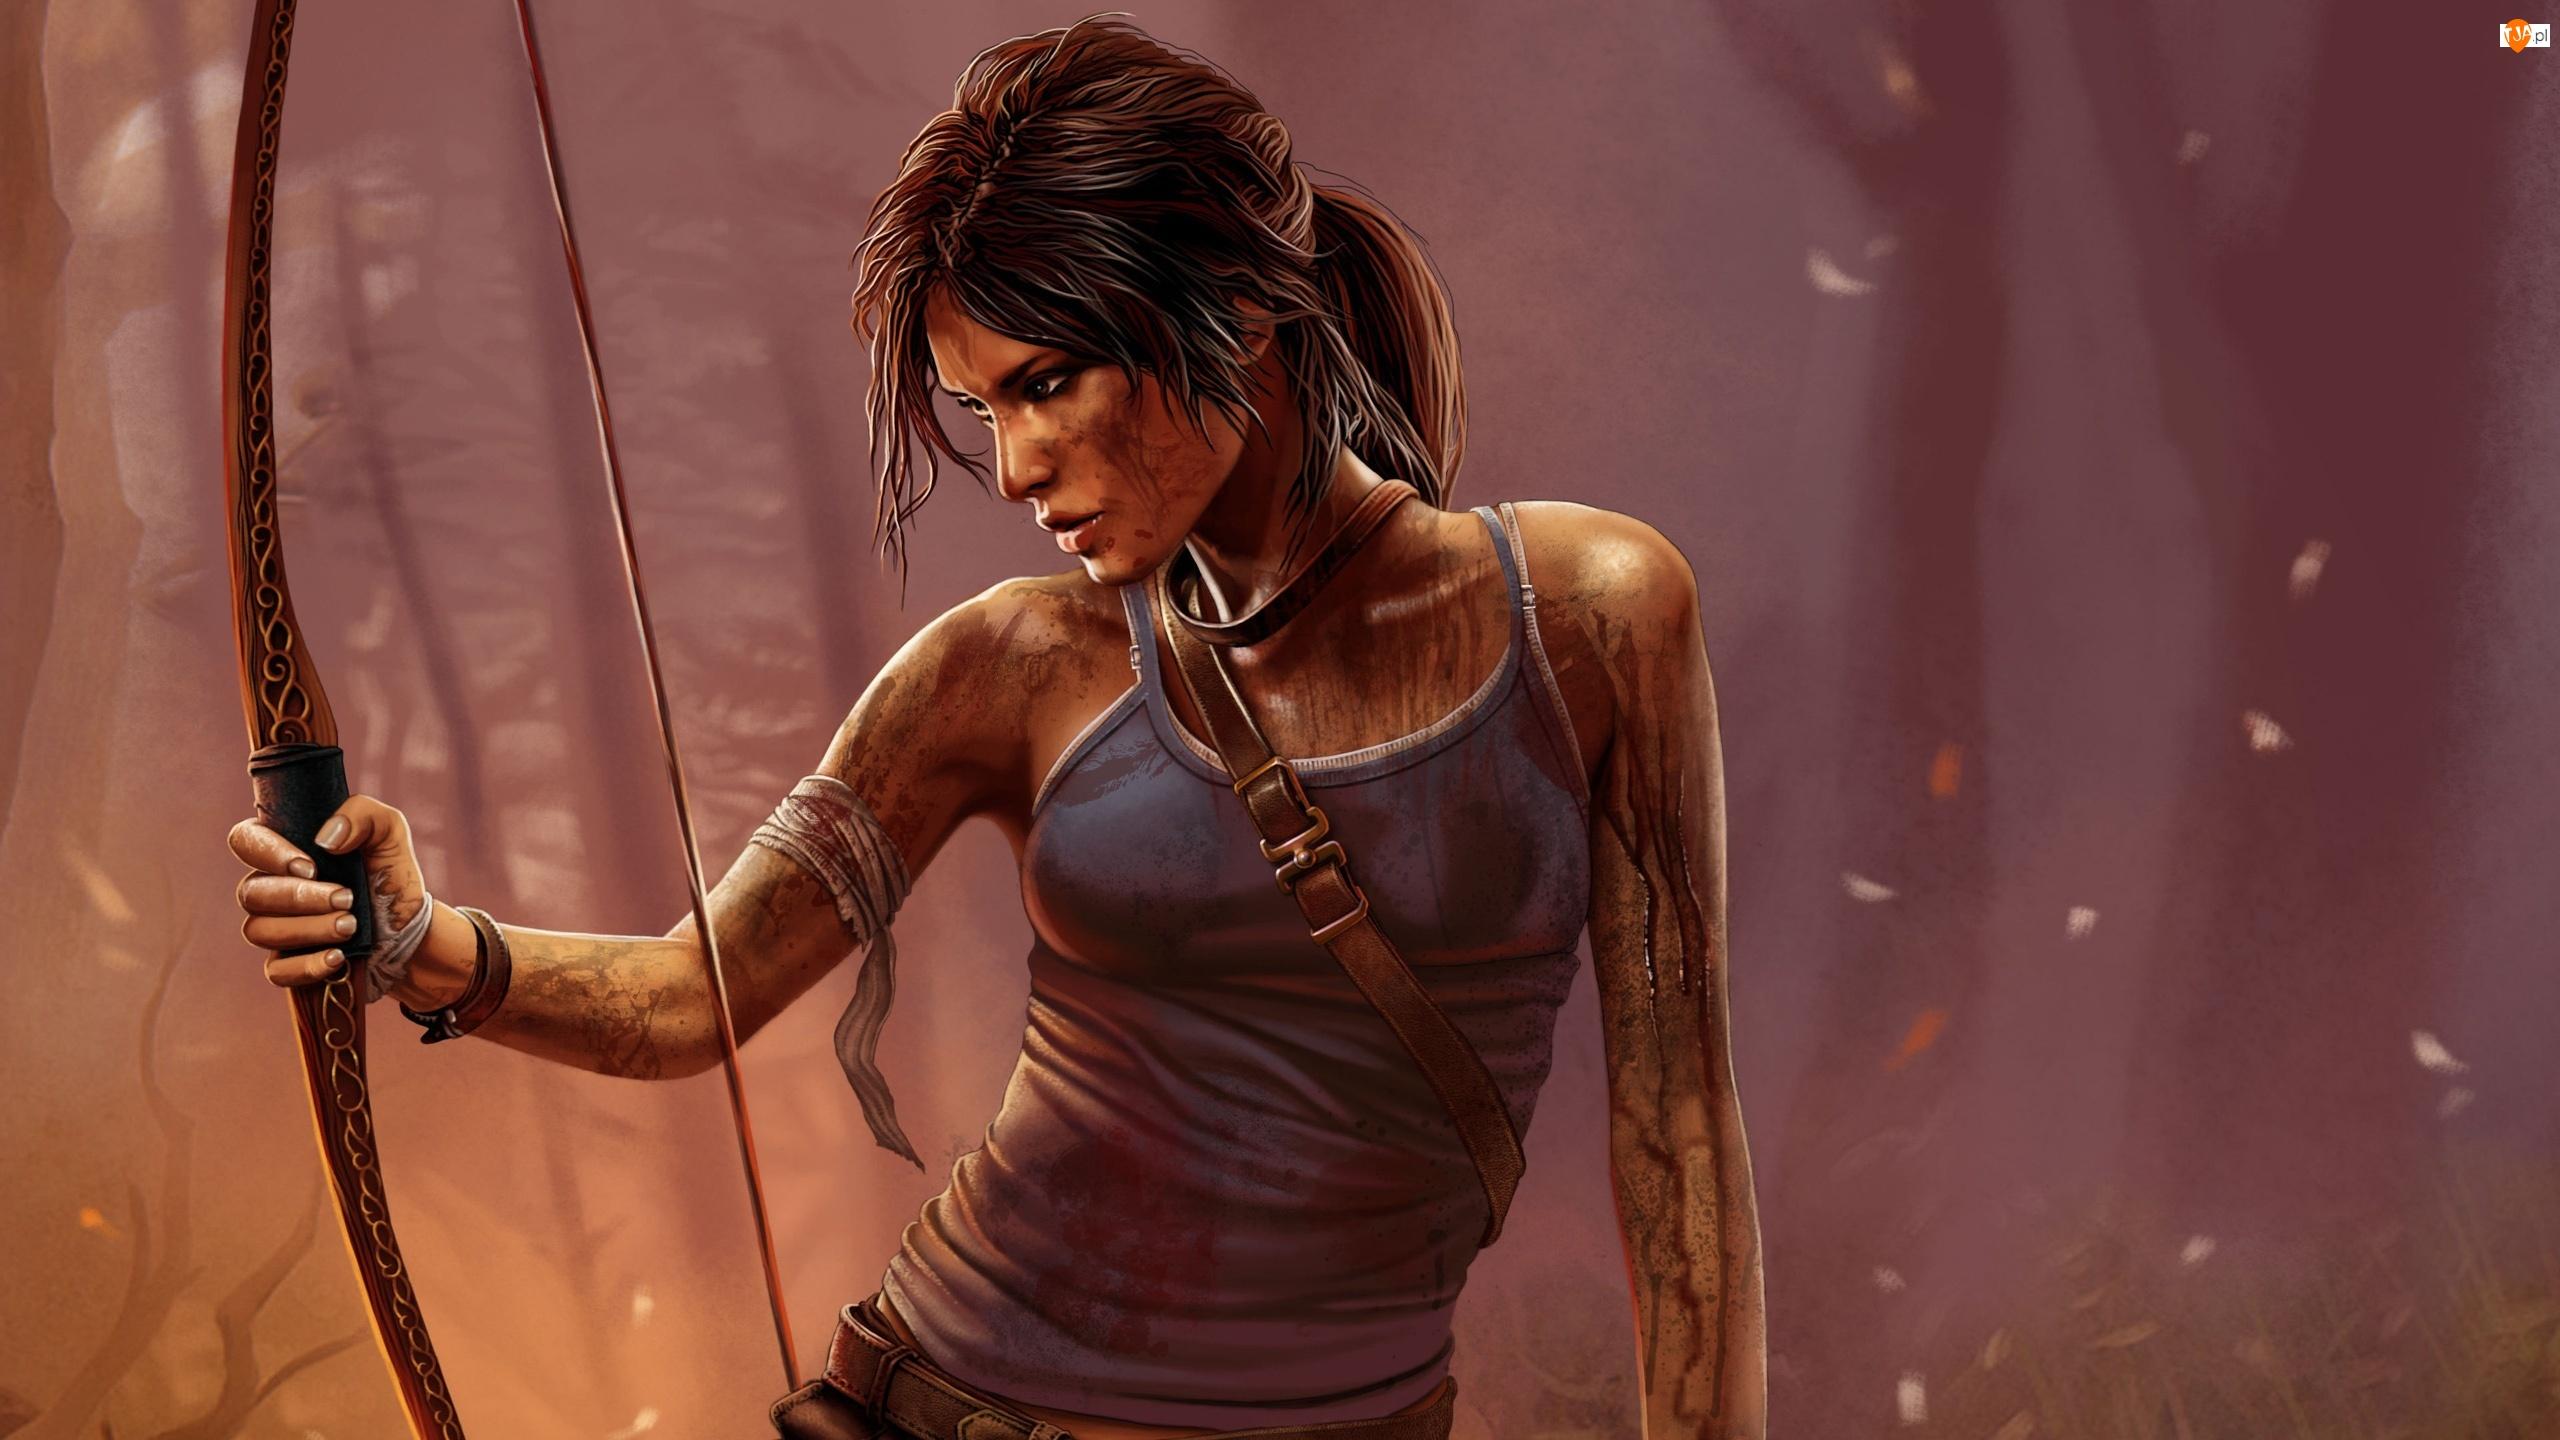 Łuk, Lara, Raider, Kobieta, Tomb, Gra, Croft